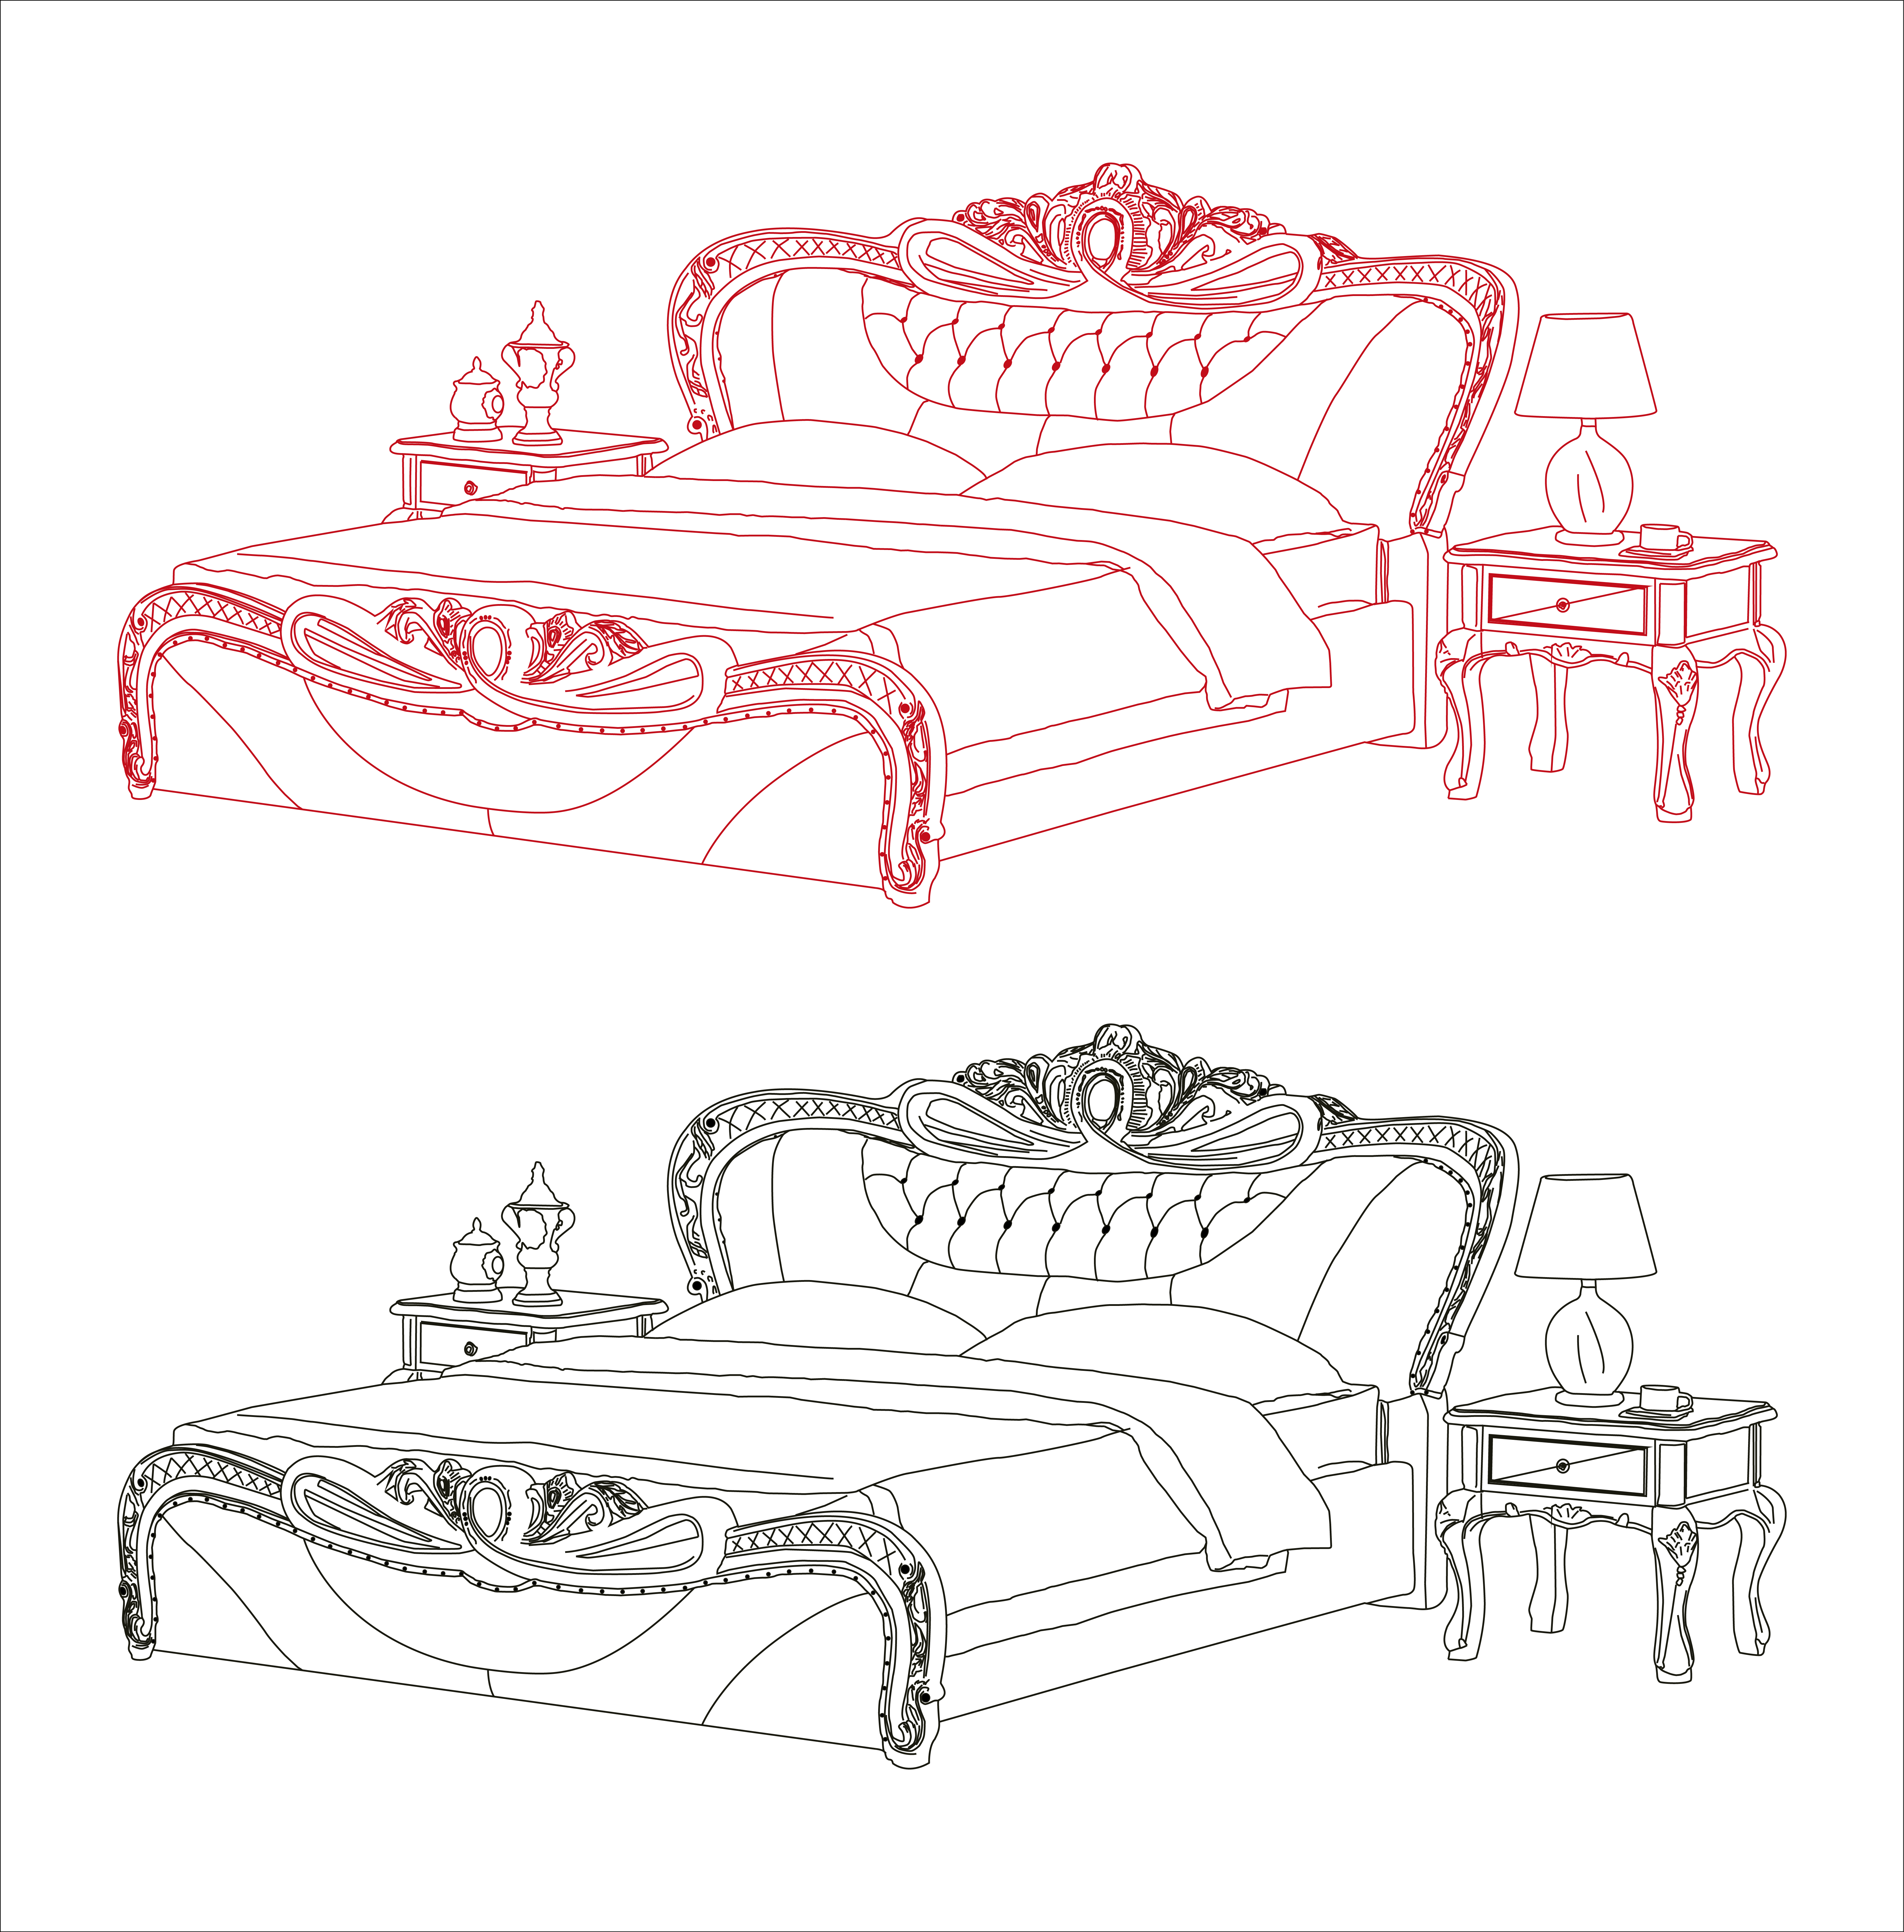 clip art freeuse stock Drawing sheet hospital bed. Frame mattress continental transprent